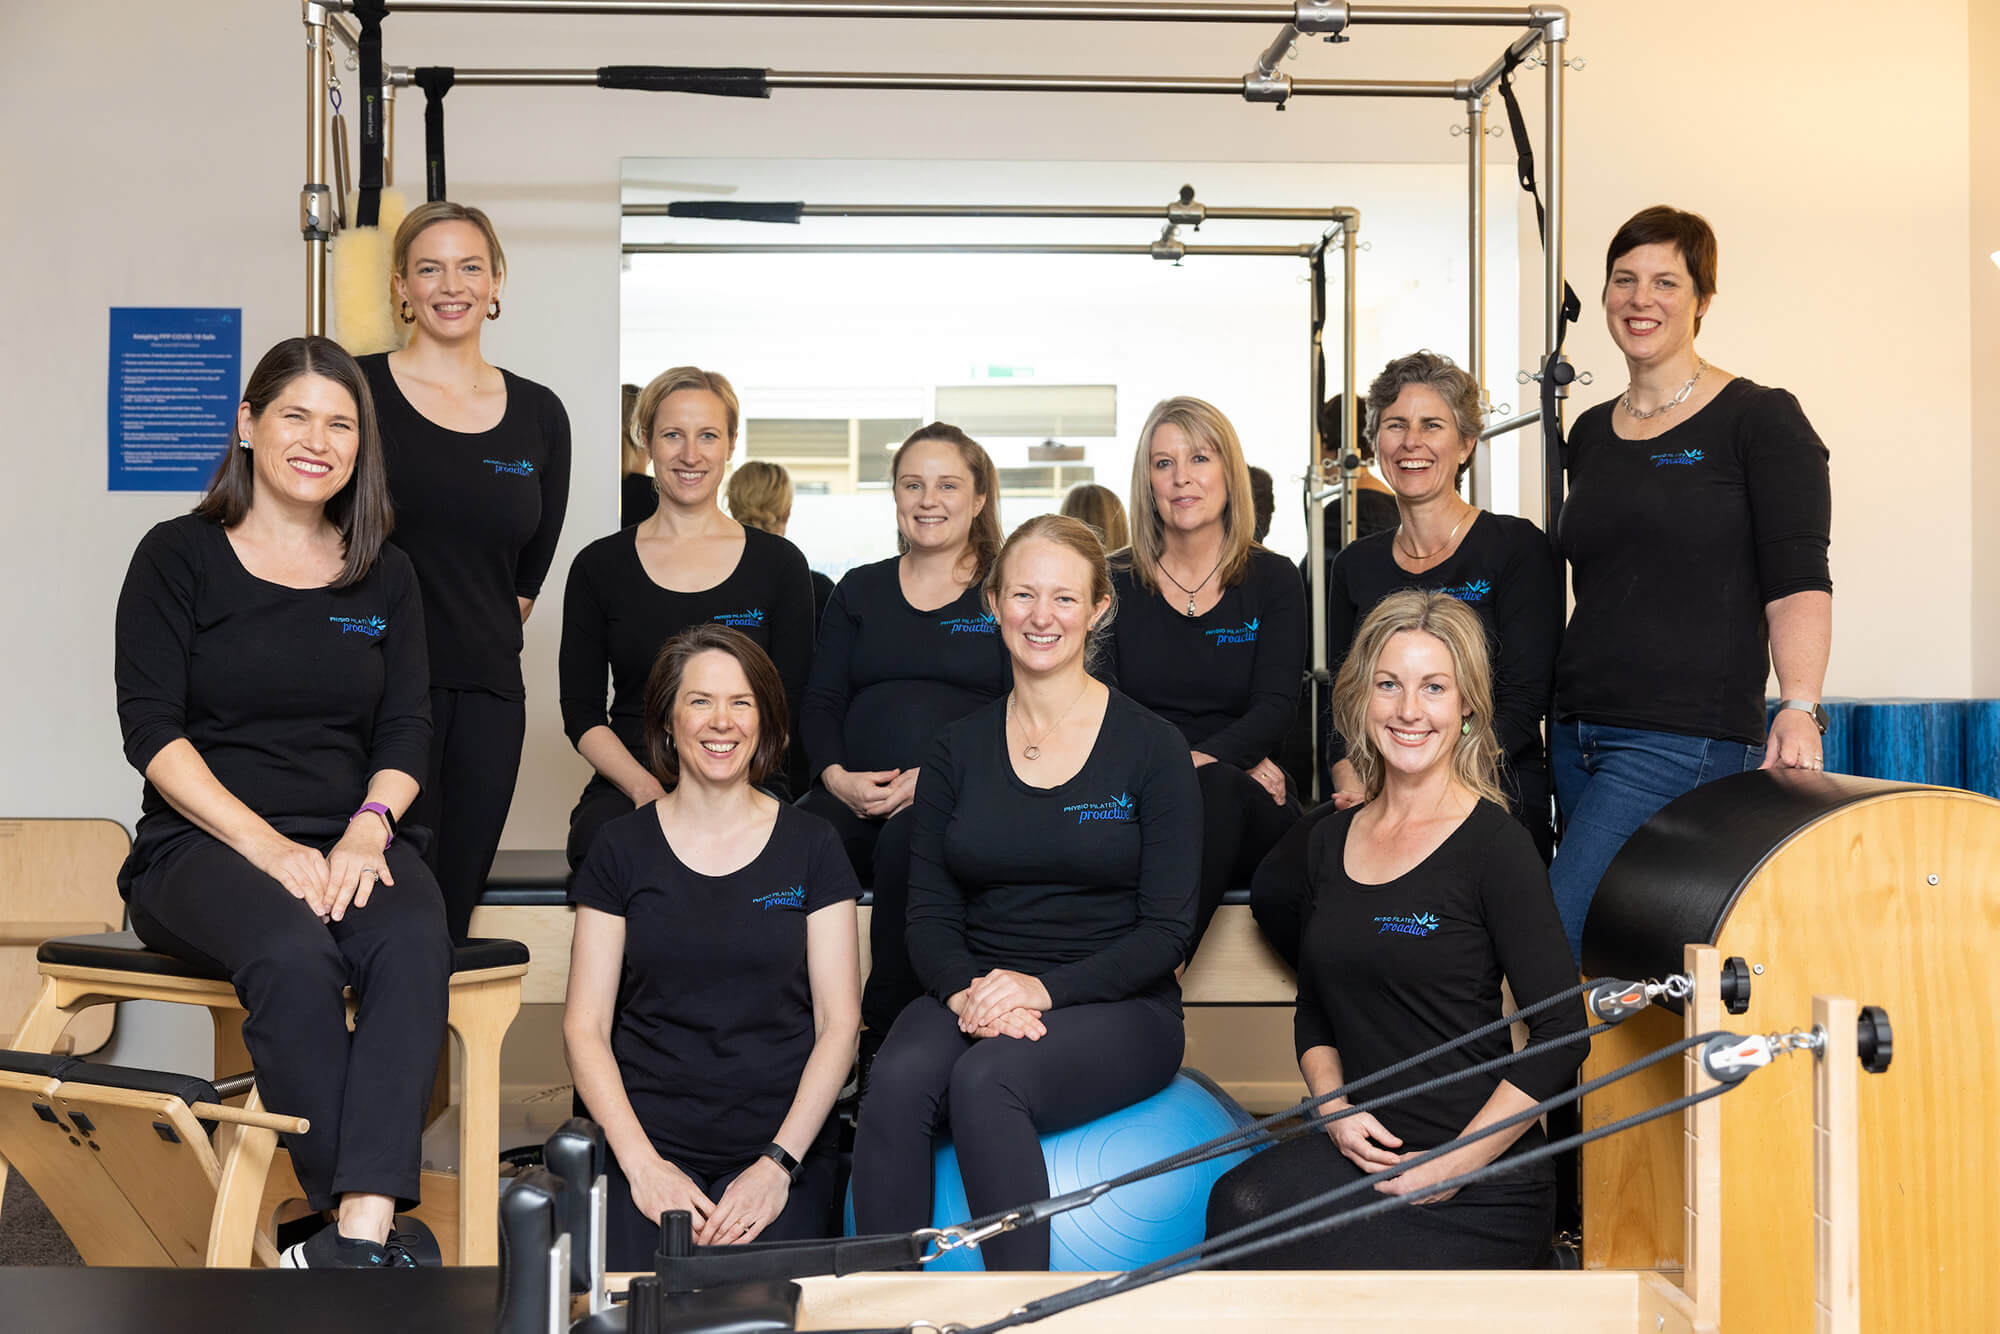 Physio Pilates Proactive Team